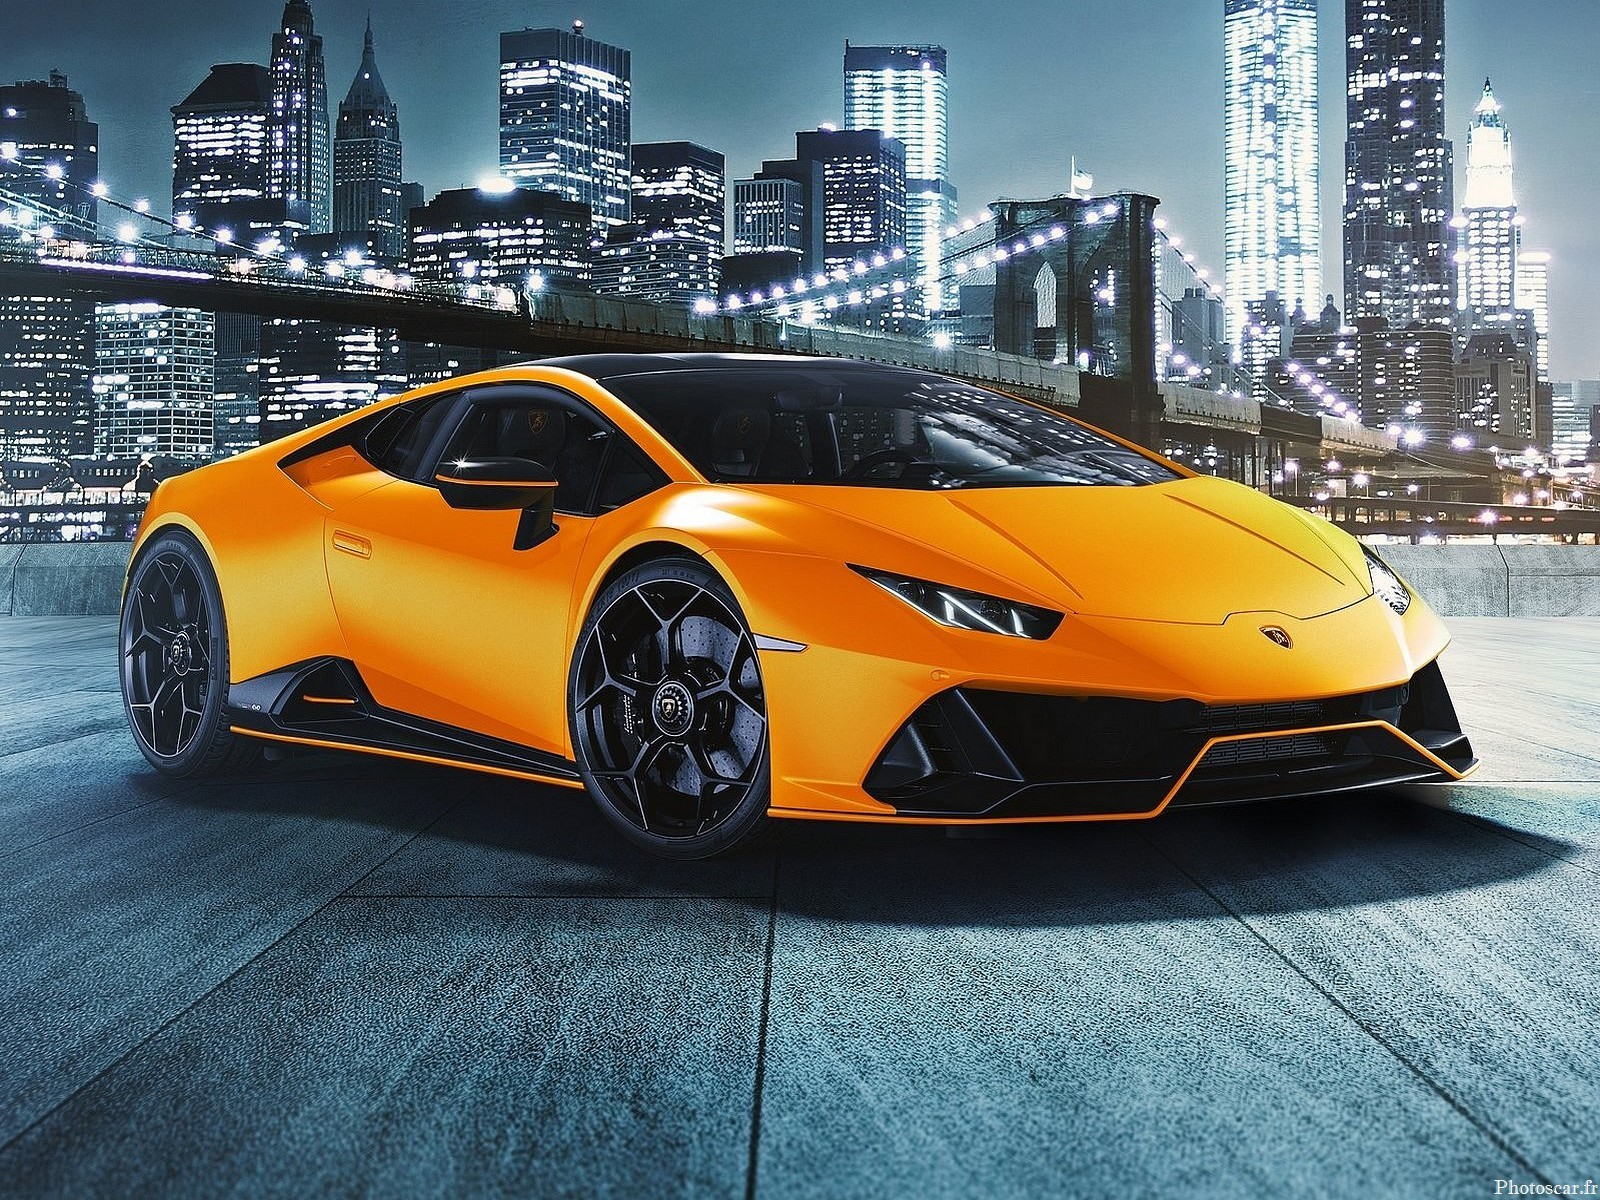 Lamborghini Huracan Evo Fluo Capsule 2021